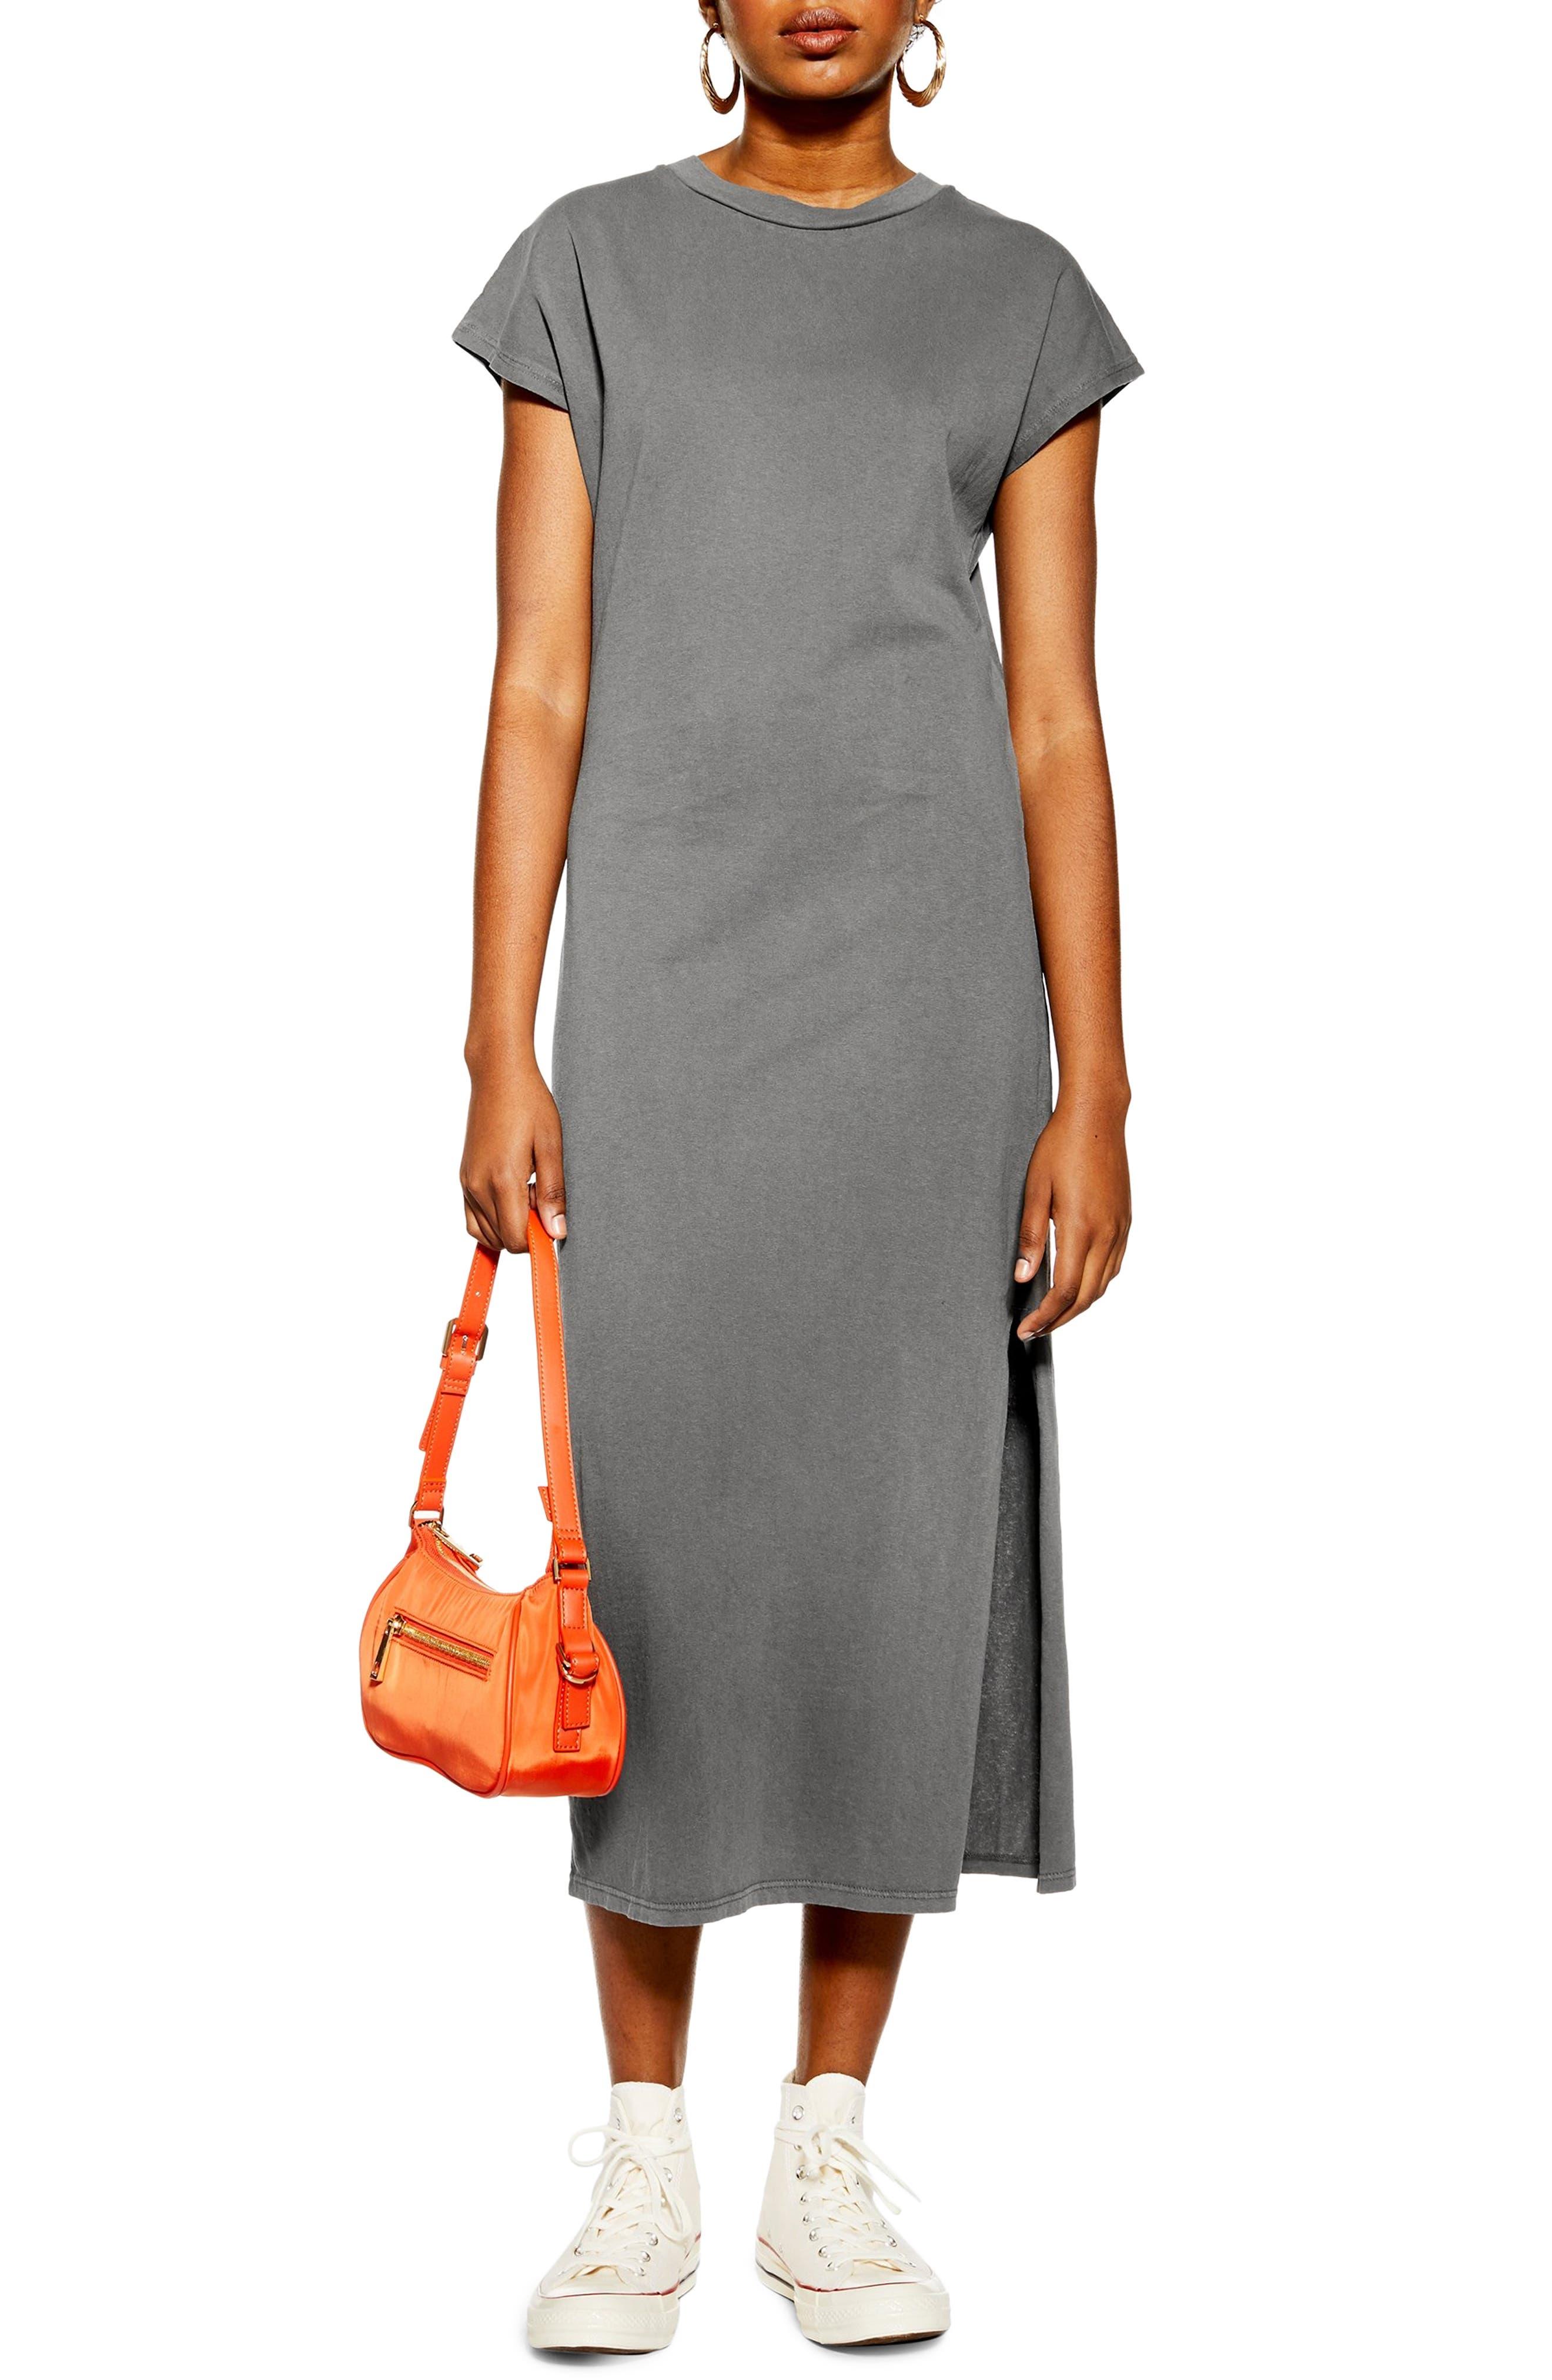 Topshop Acid Wash Midi Dress, US (fits like 0) - Black